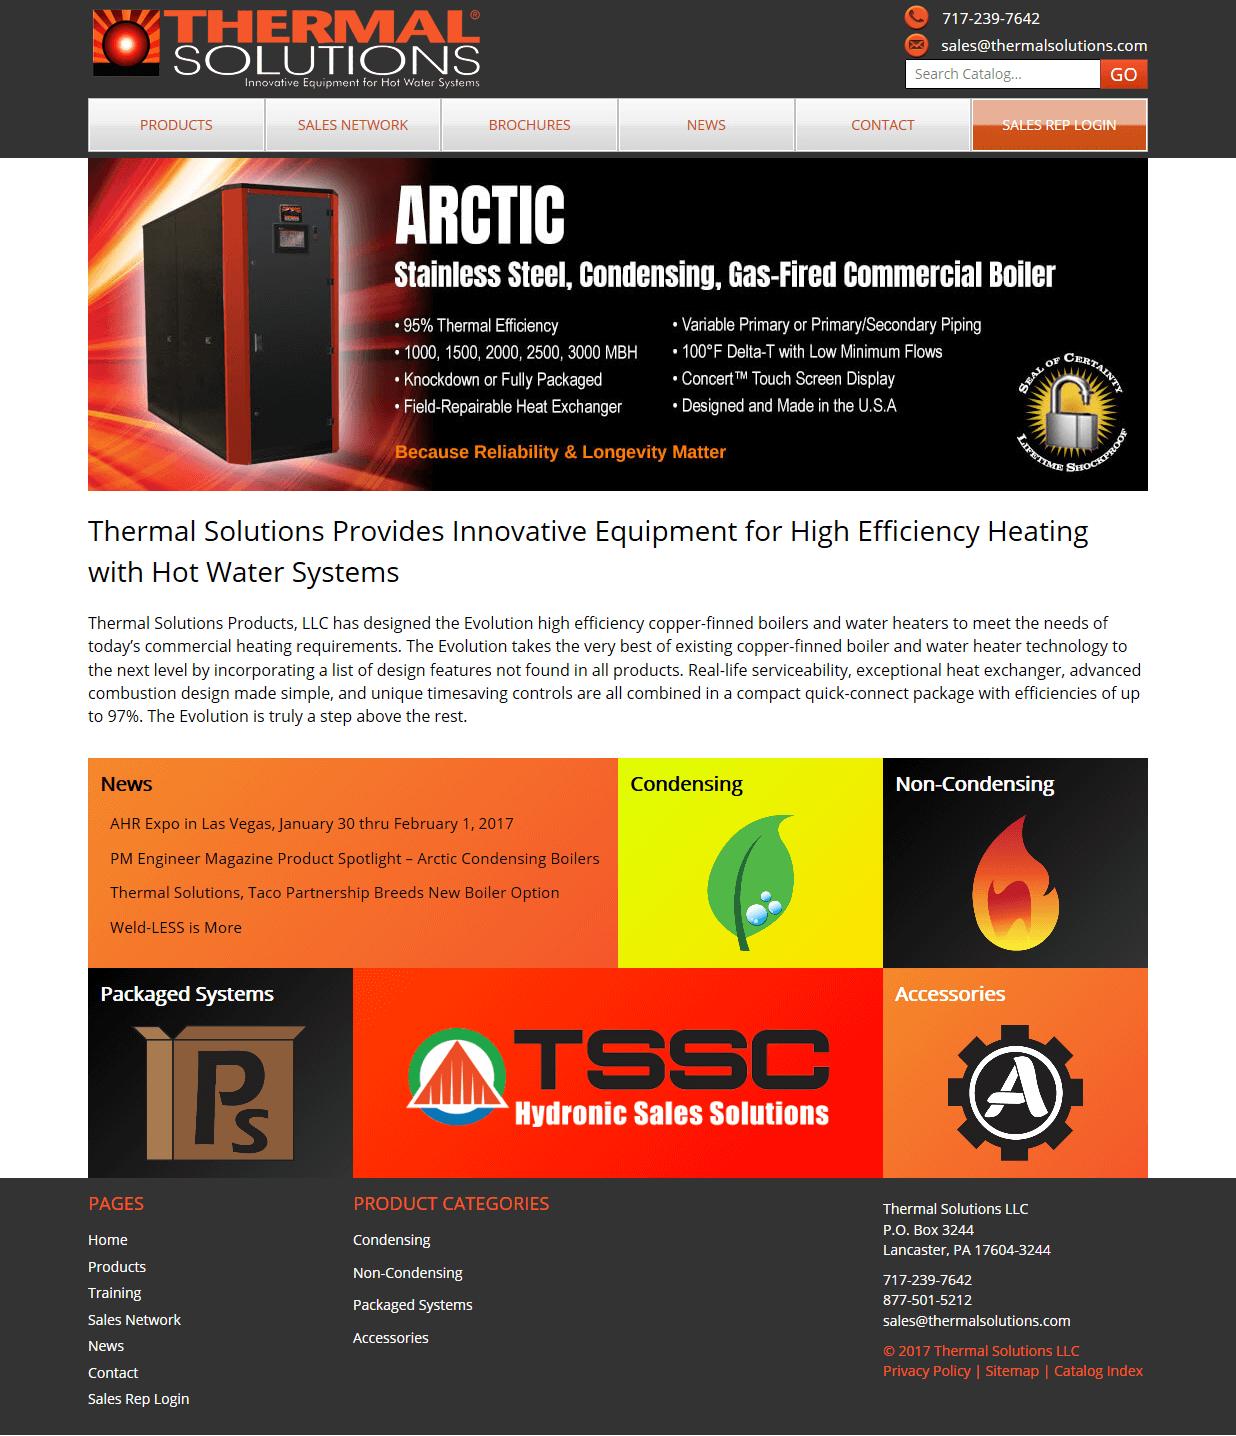 Thermal Solutions, LLC